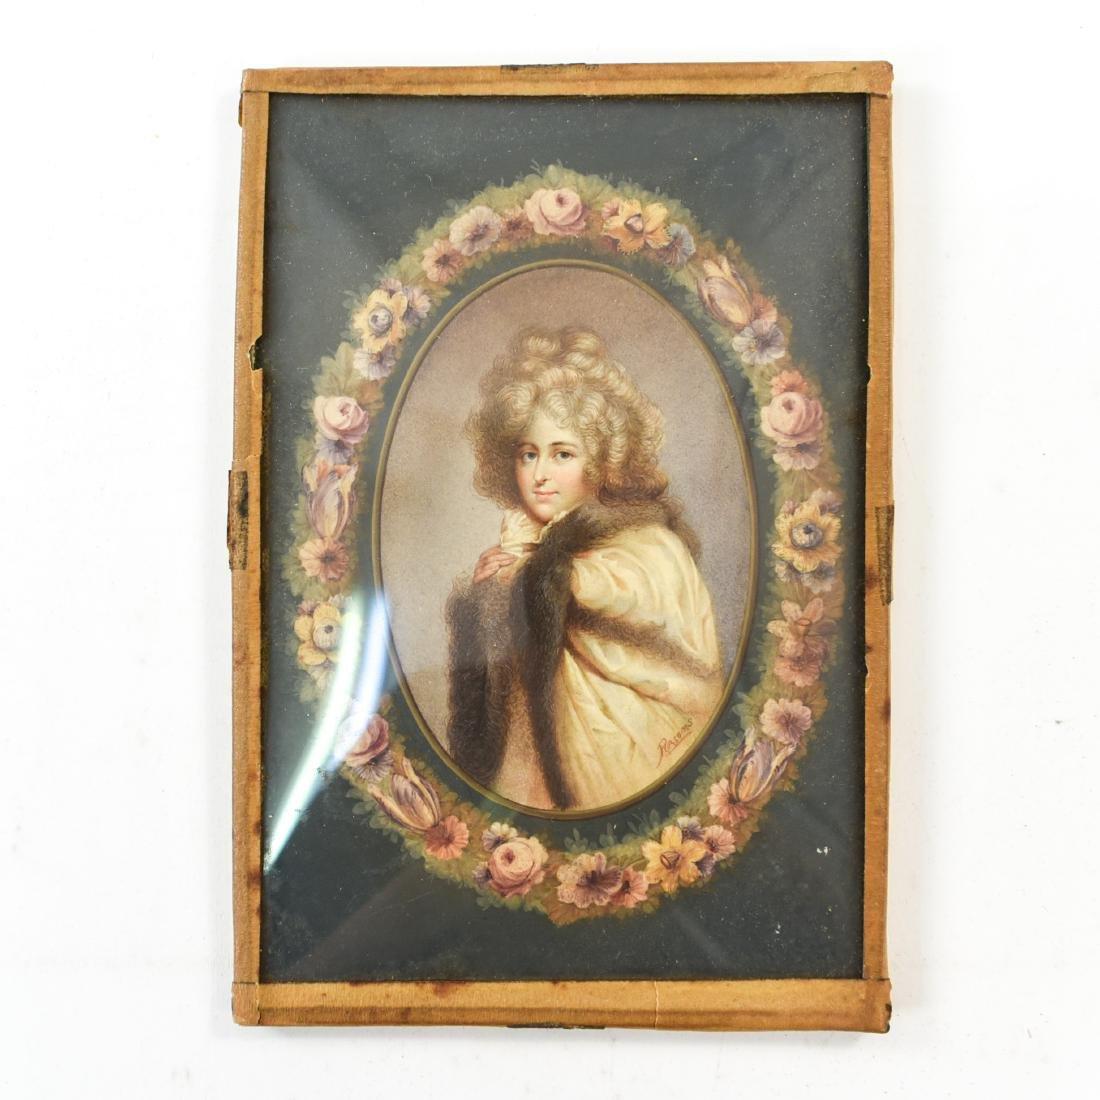 PORTRAIT OF WOMAN IN CONVEX GLASS